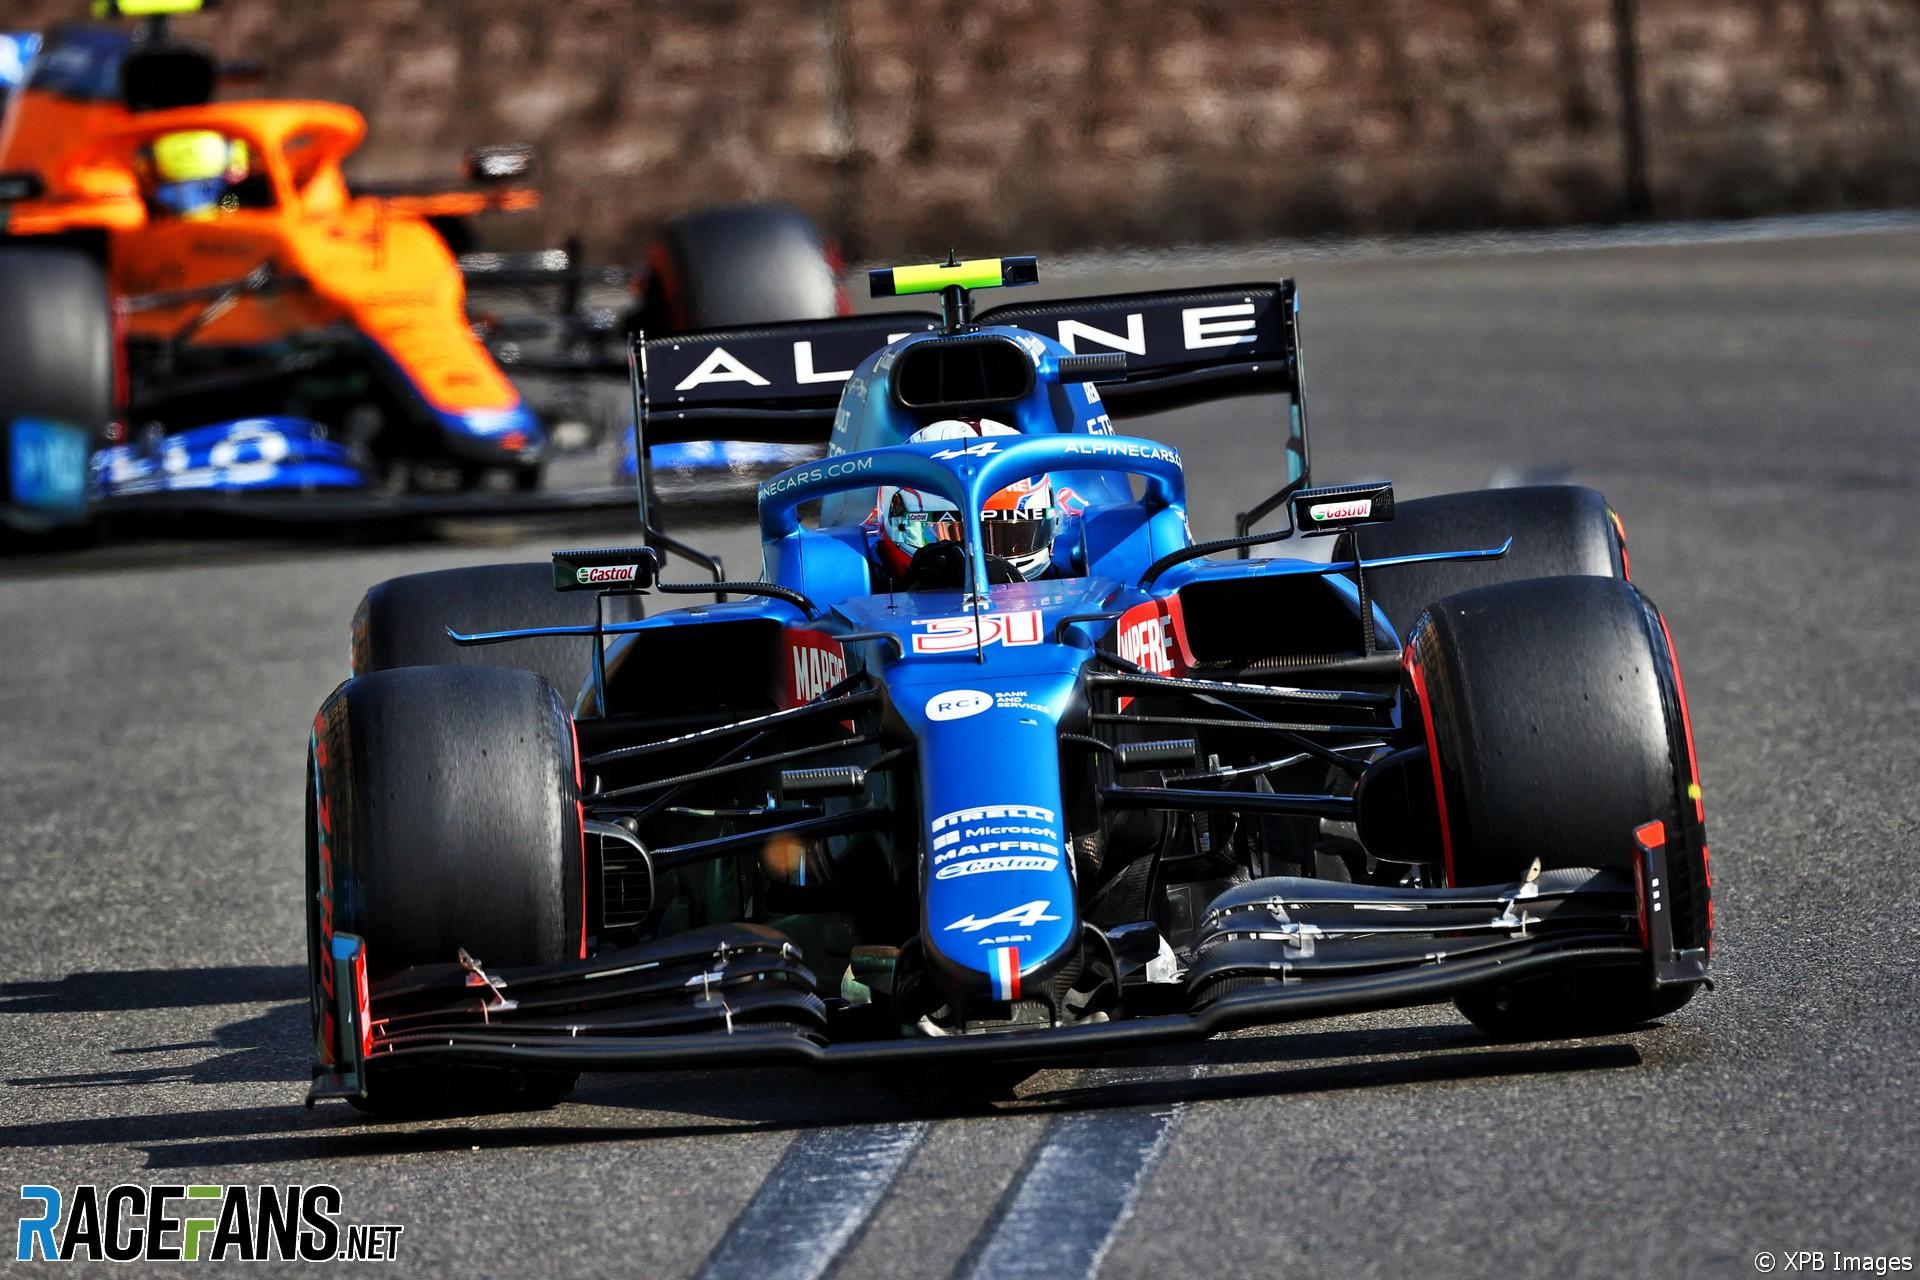 Esteban Ocon, Alpine, Baku City Circuit, 2021